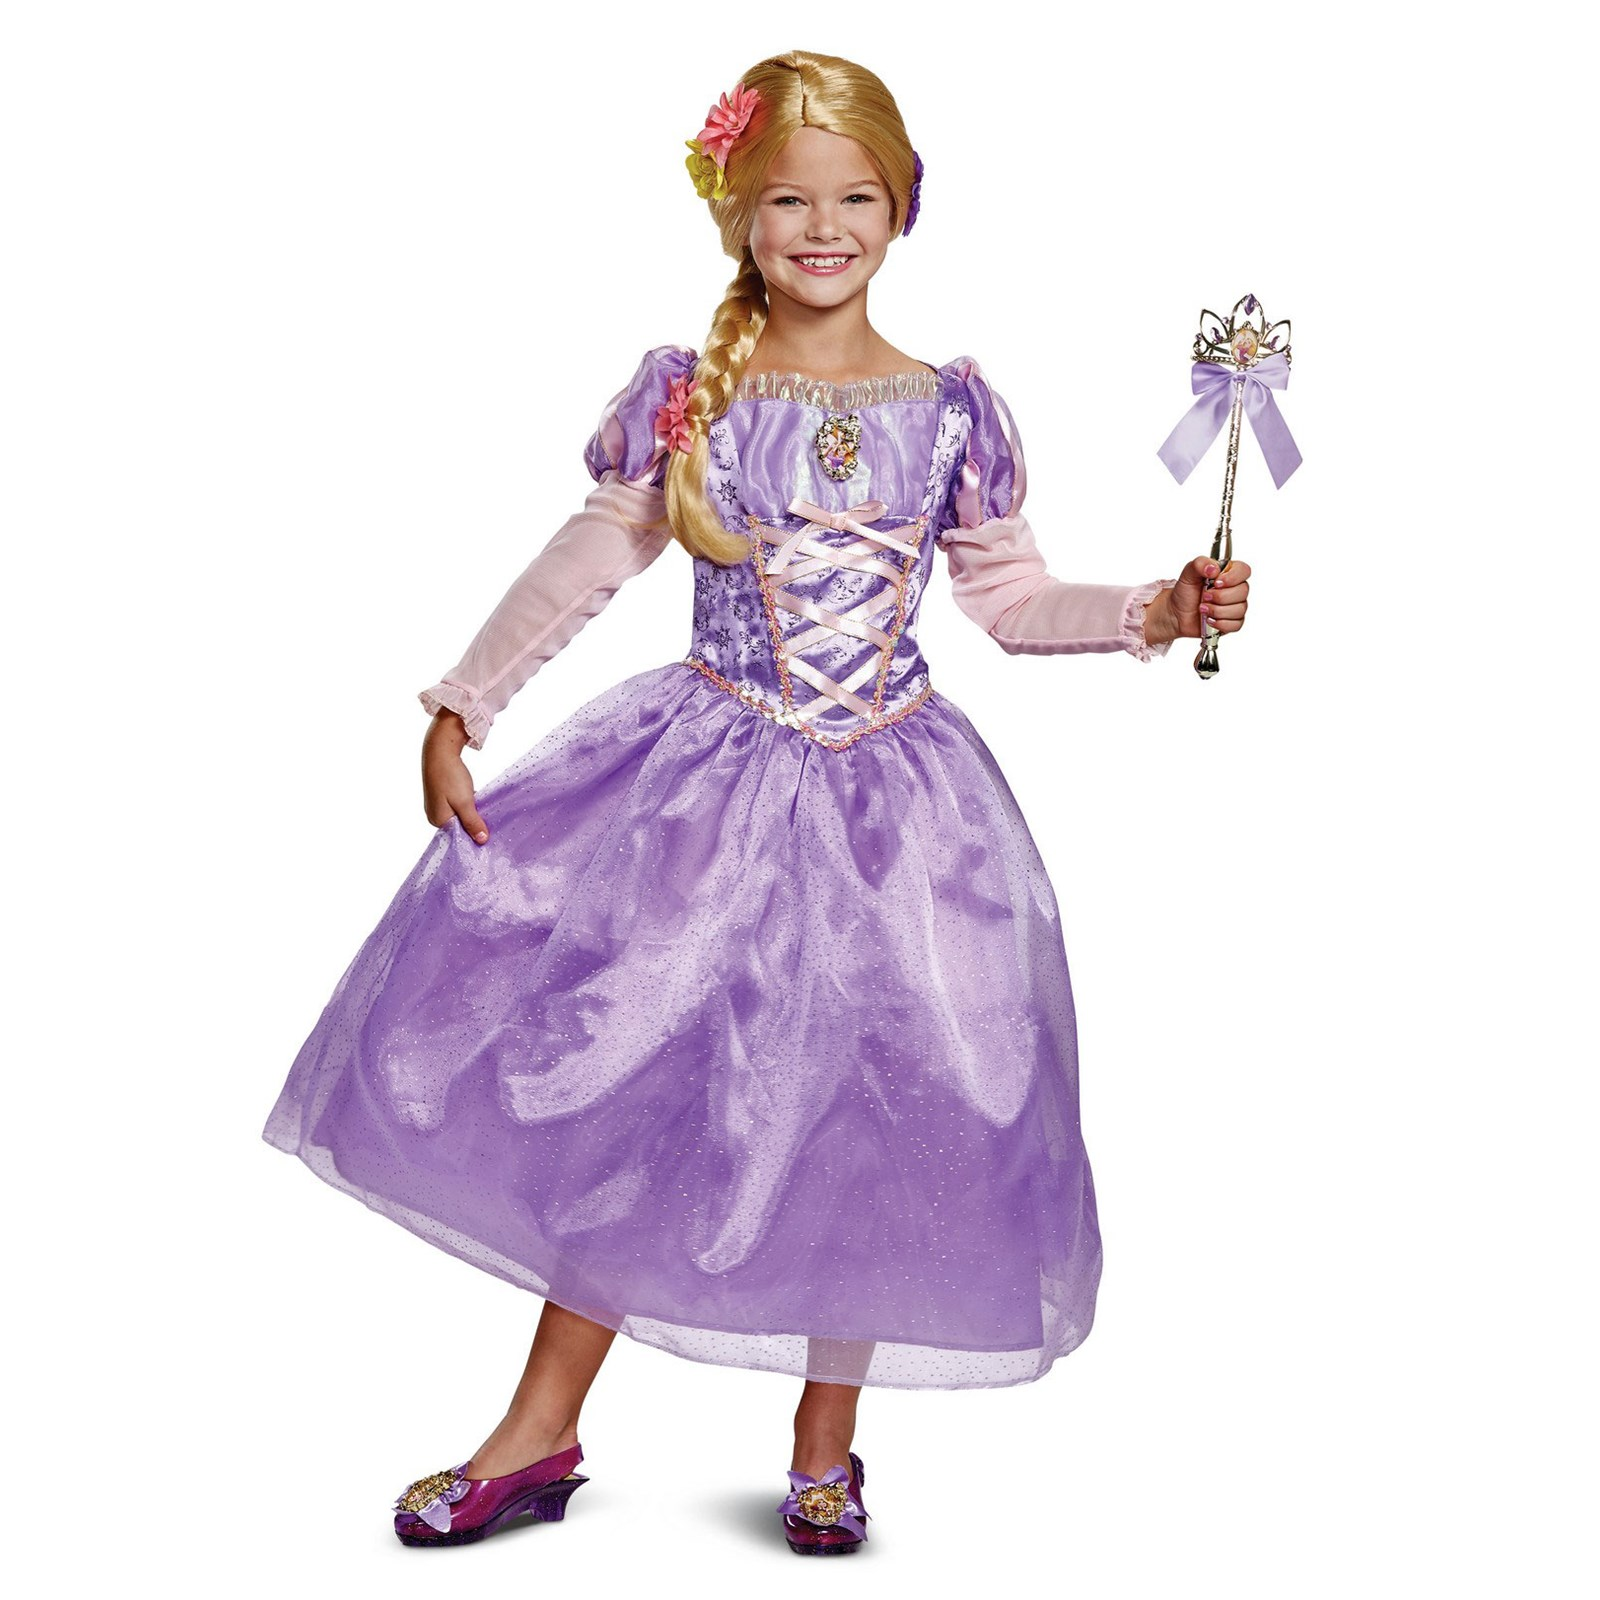 Tangled Rapunzel Deluxe Child Costume